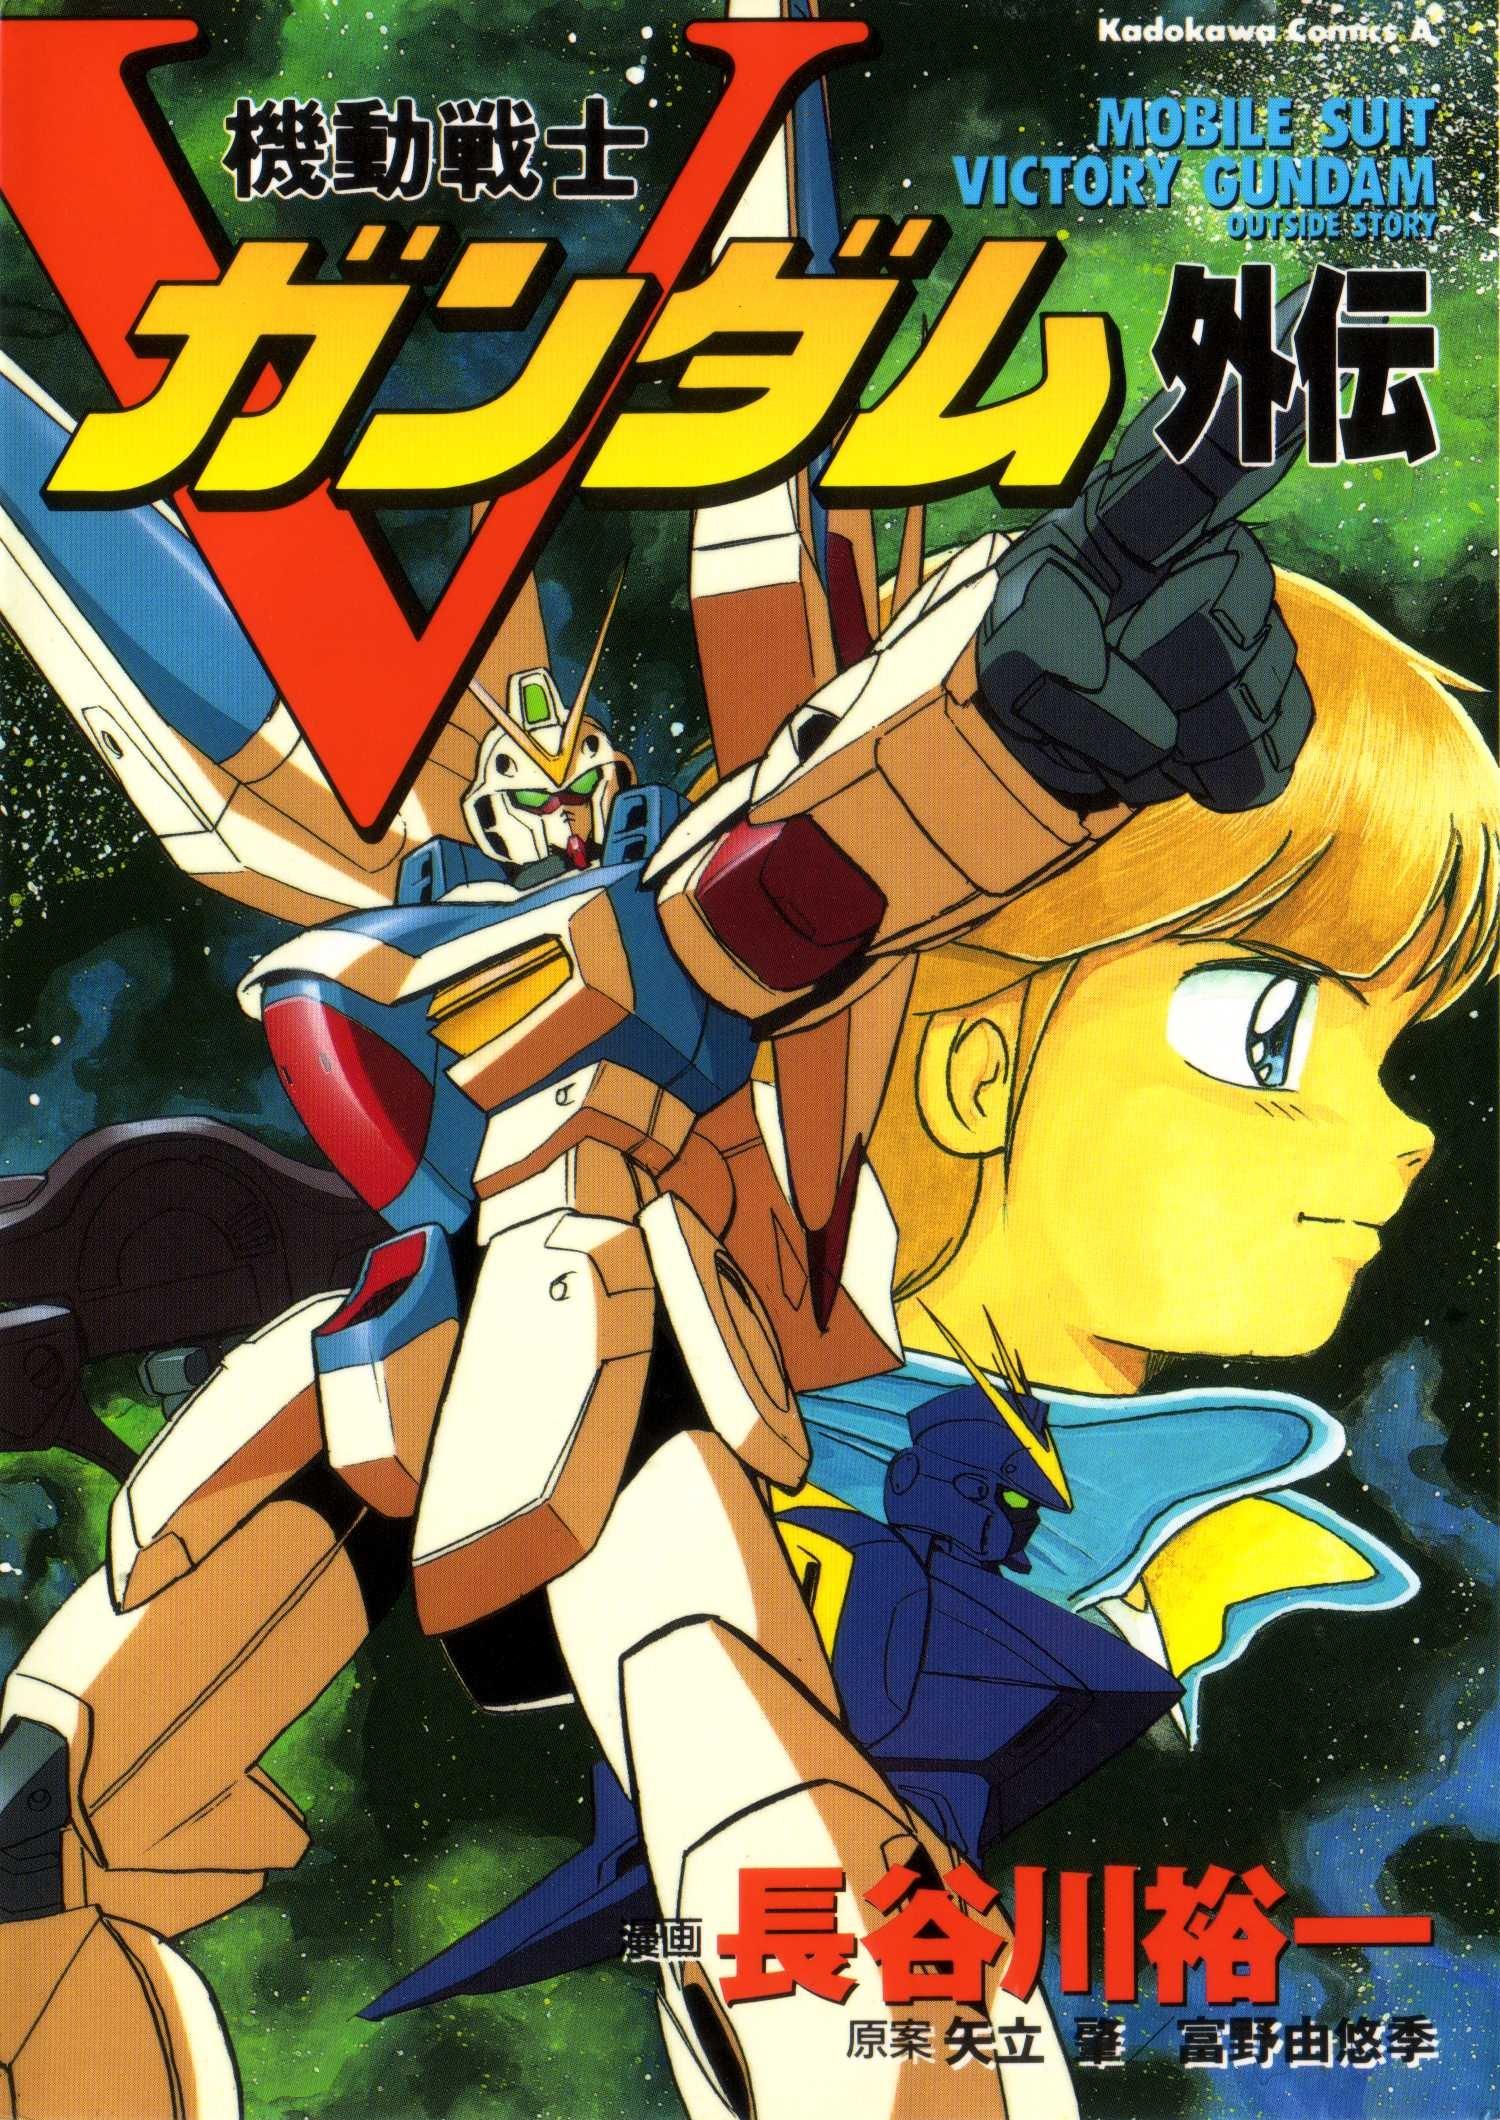 Amazing Victory Gundam Final Battle Wallpaper Download